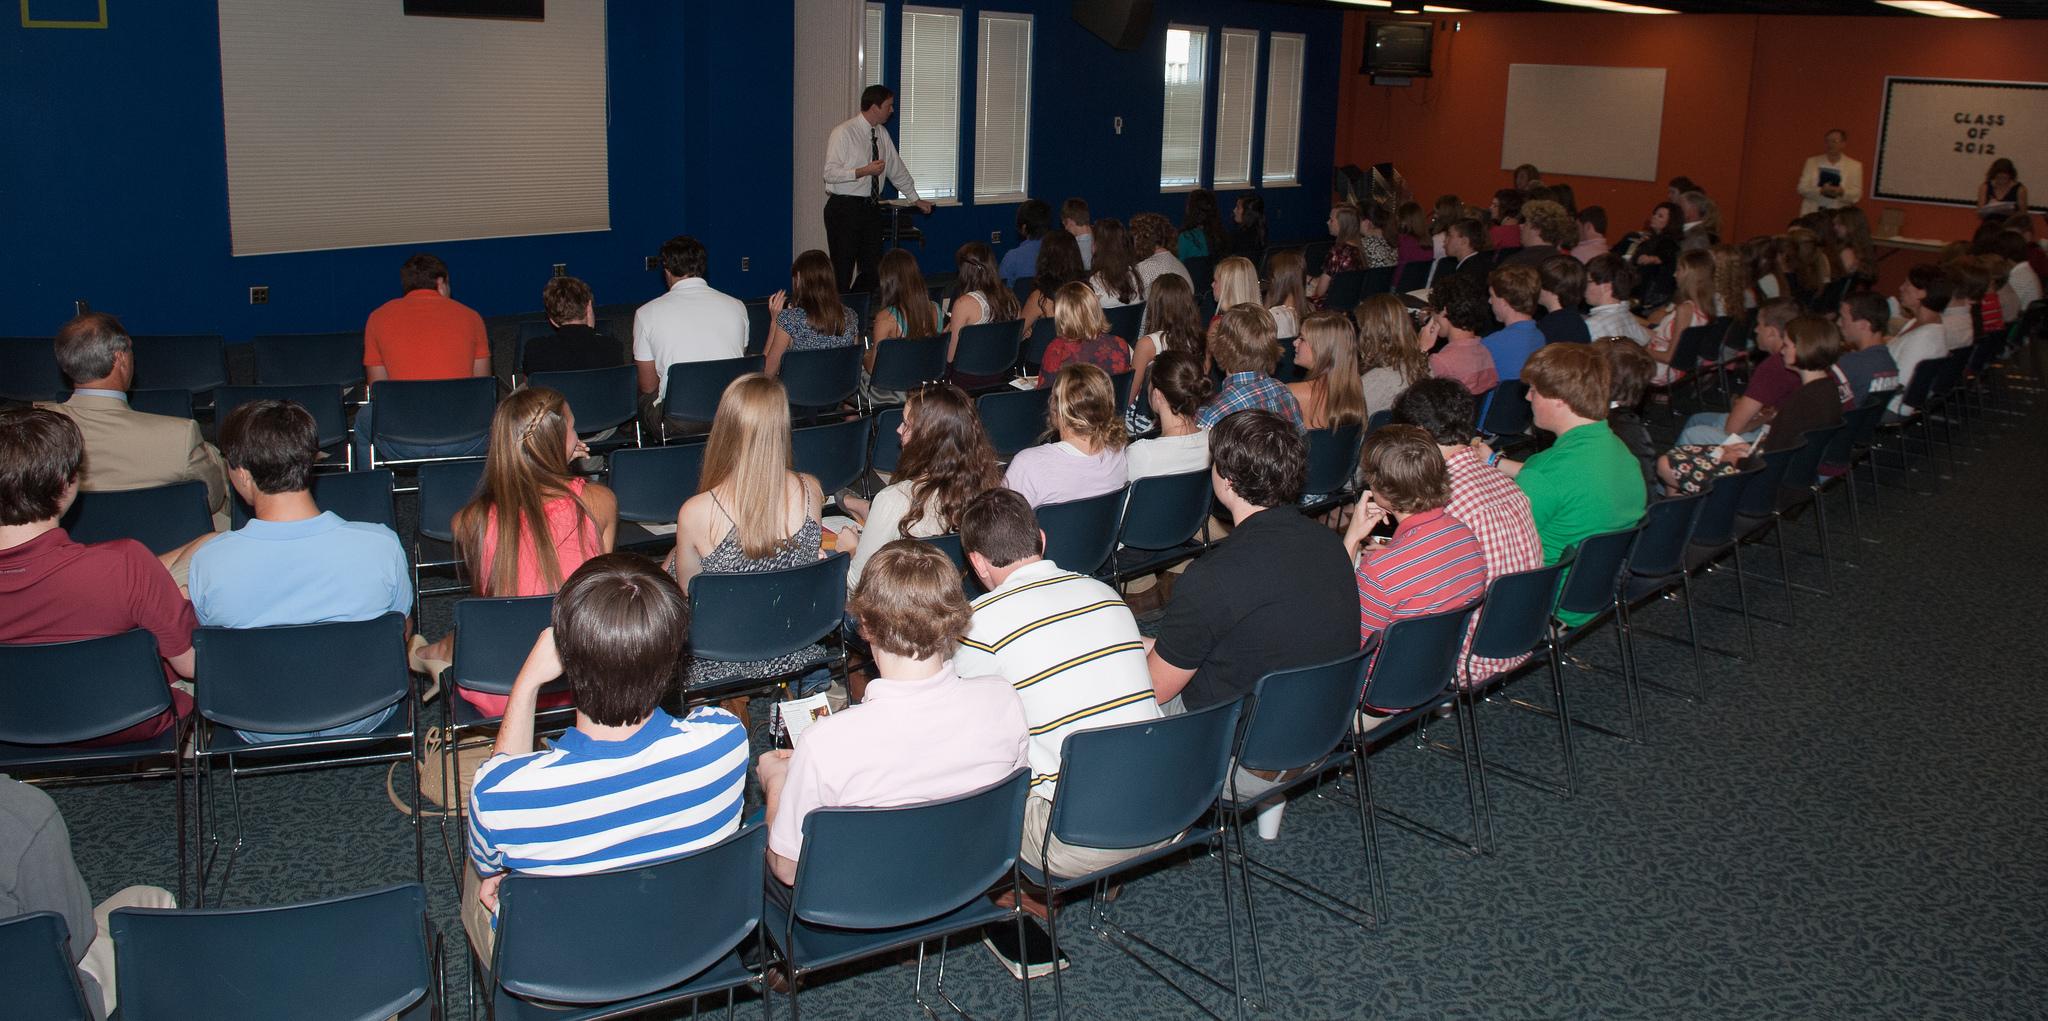 Wednesday Night Student Small Groups